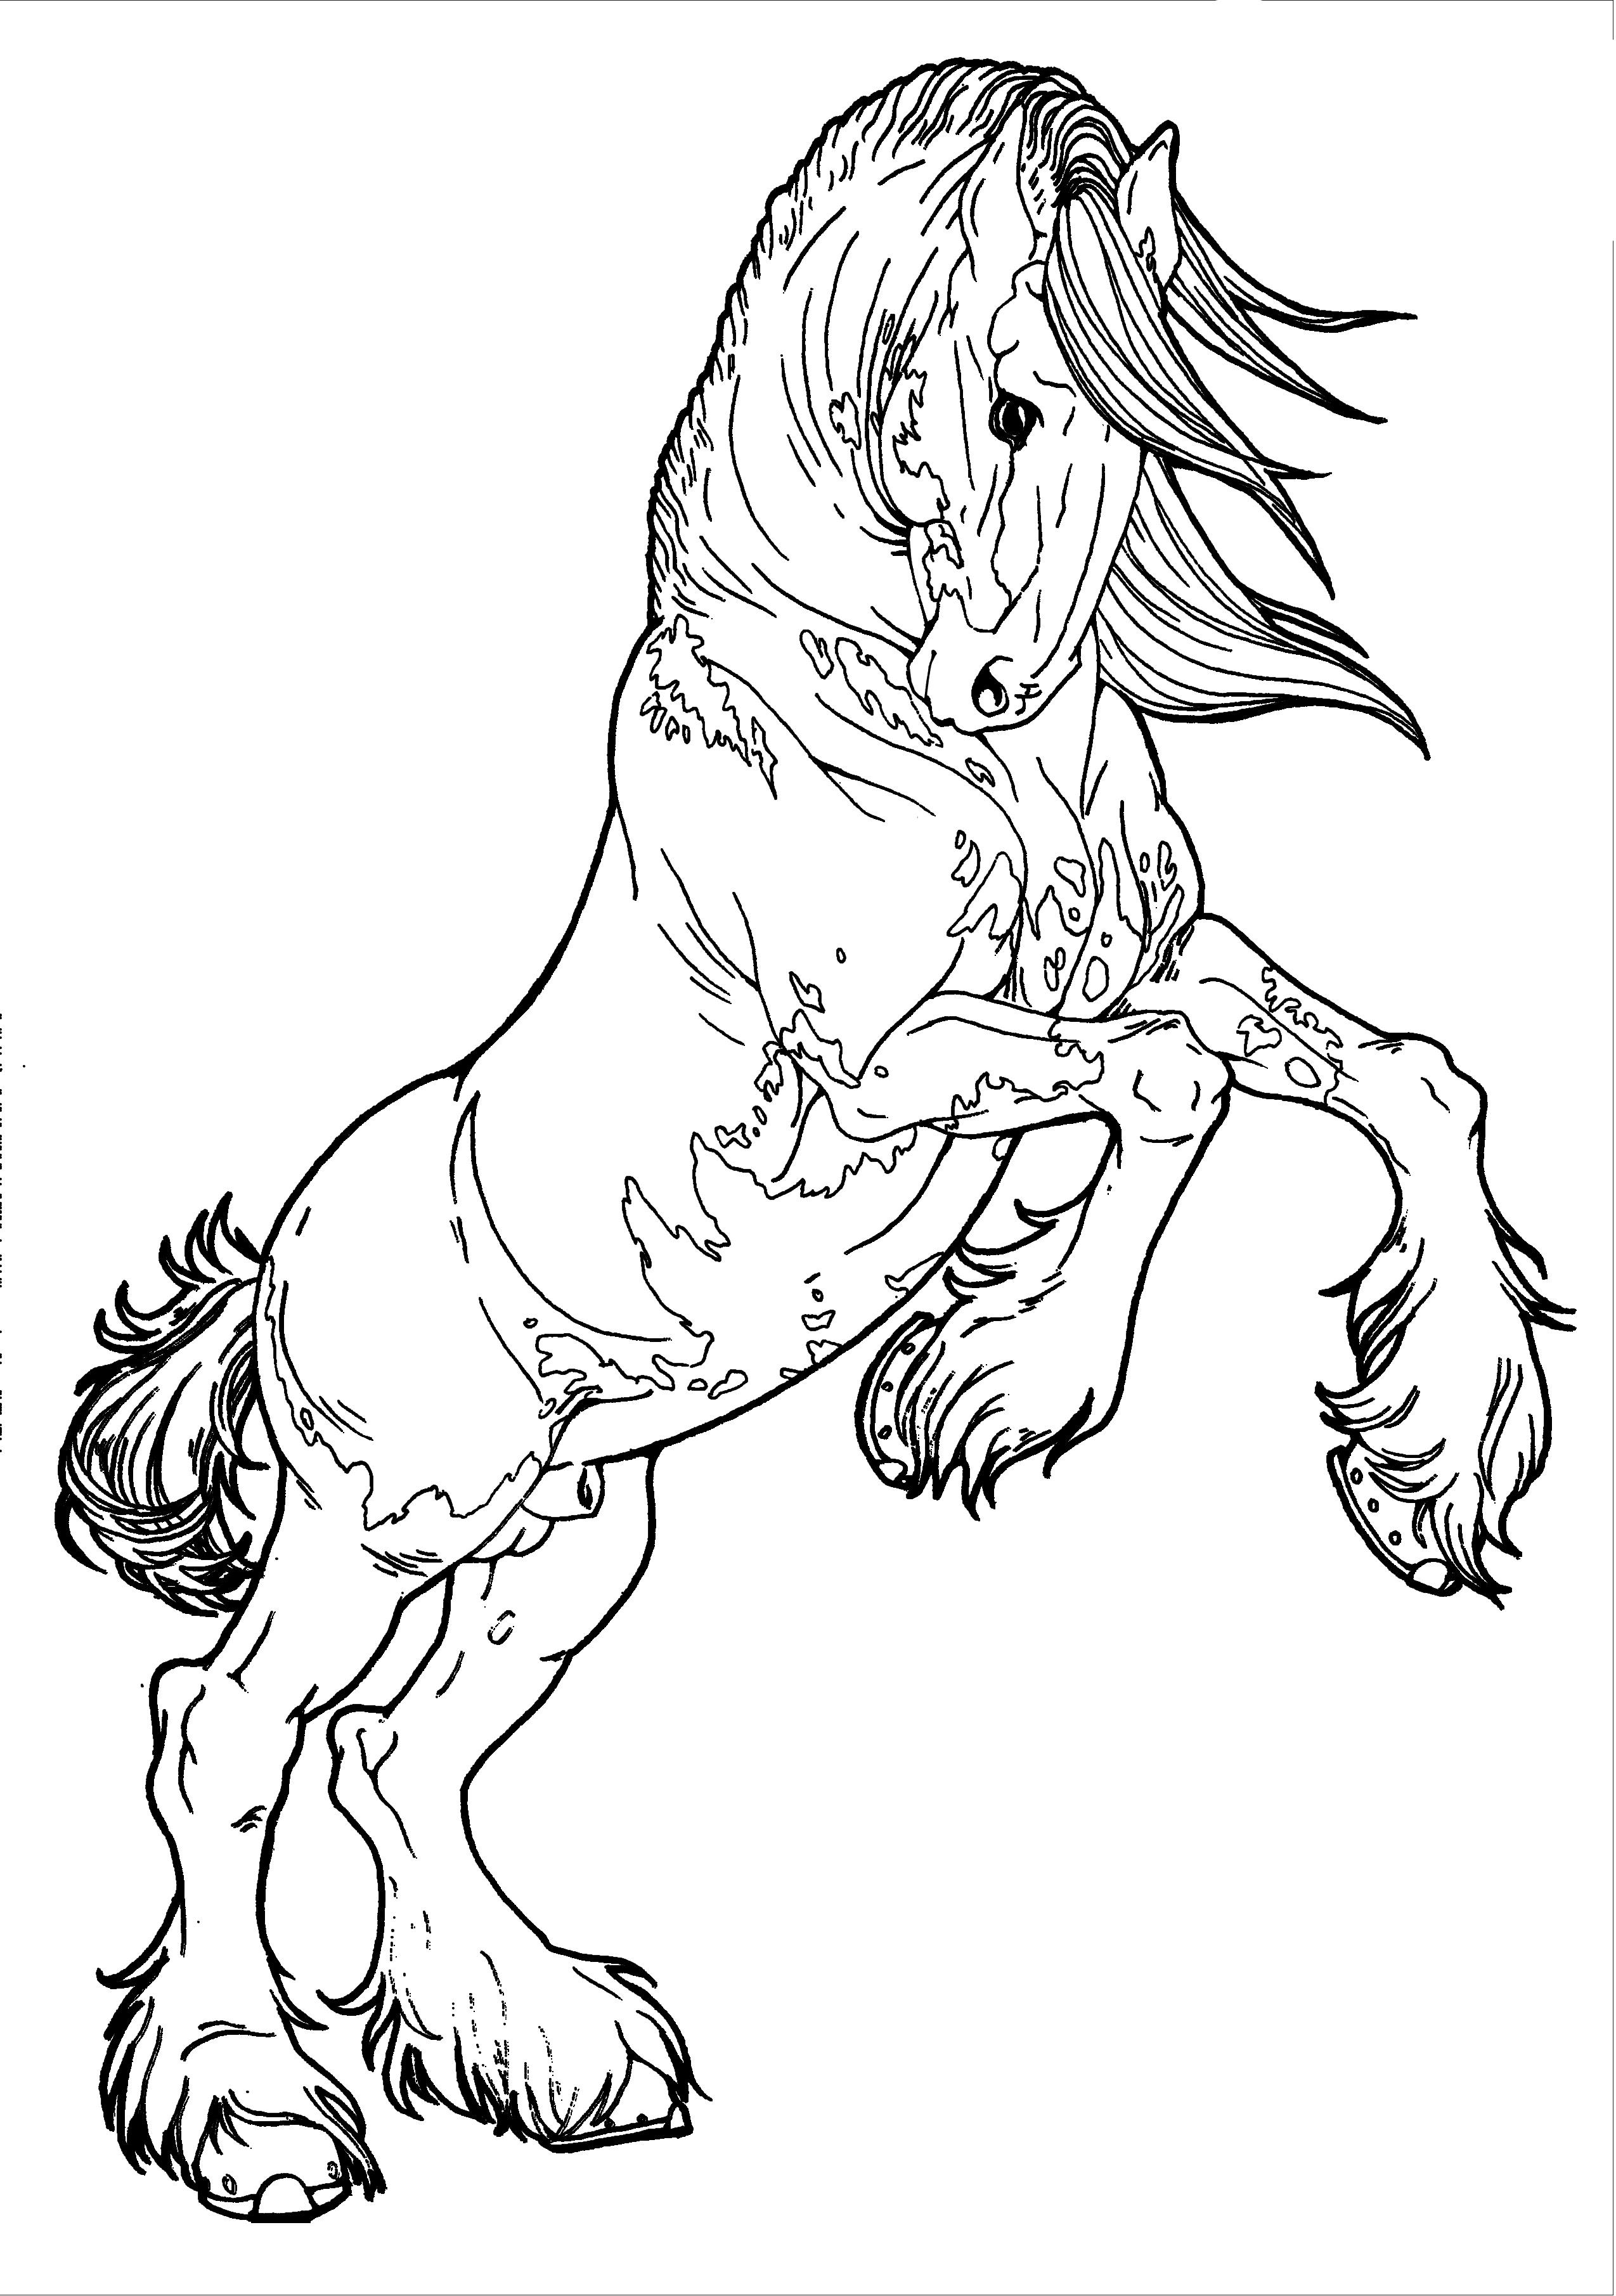 Horse Rearing Up Drawing at GetDrawings | Free download